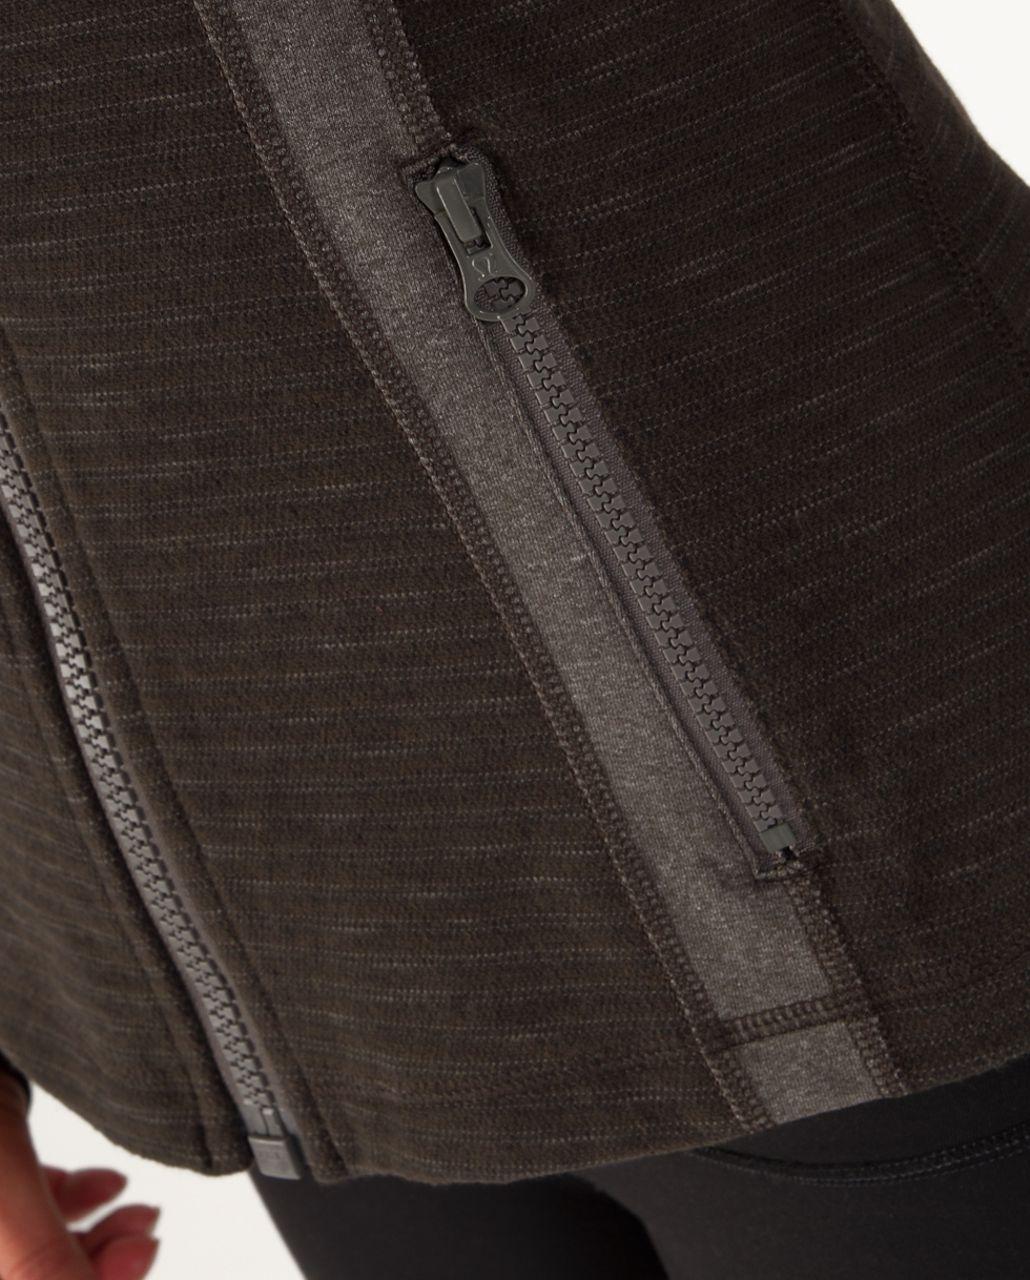 Lululemon Define Jacket *Pique - Deep Camo Pique /  Heathered Wren